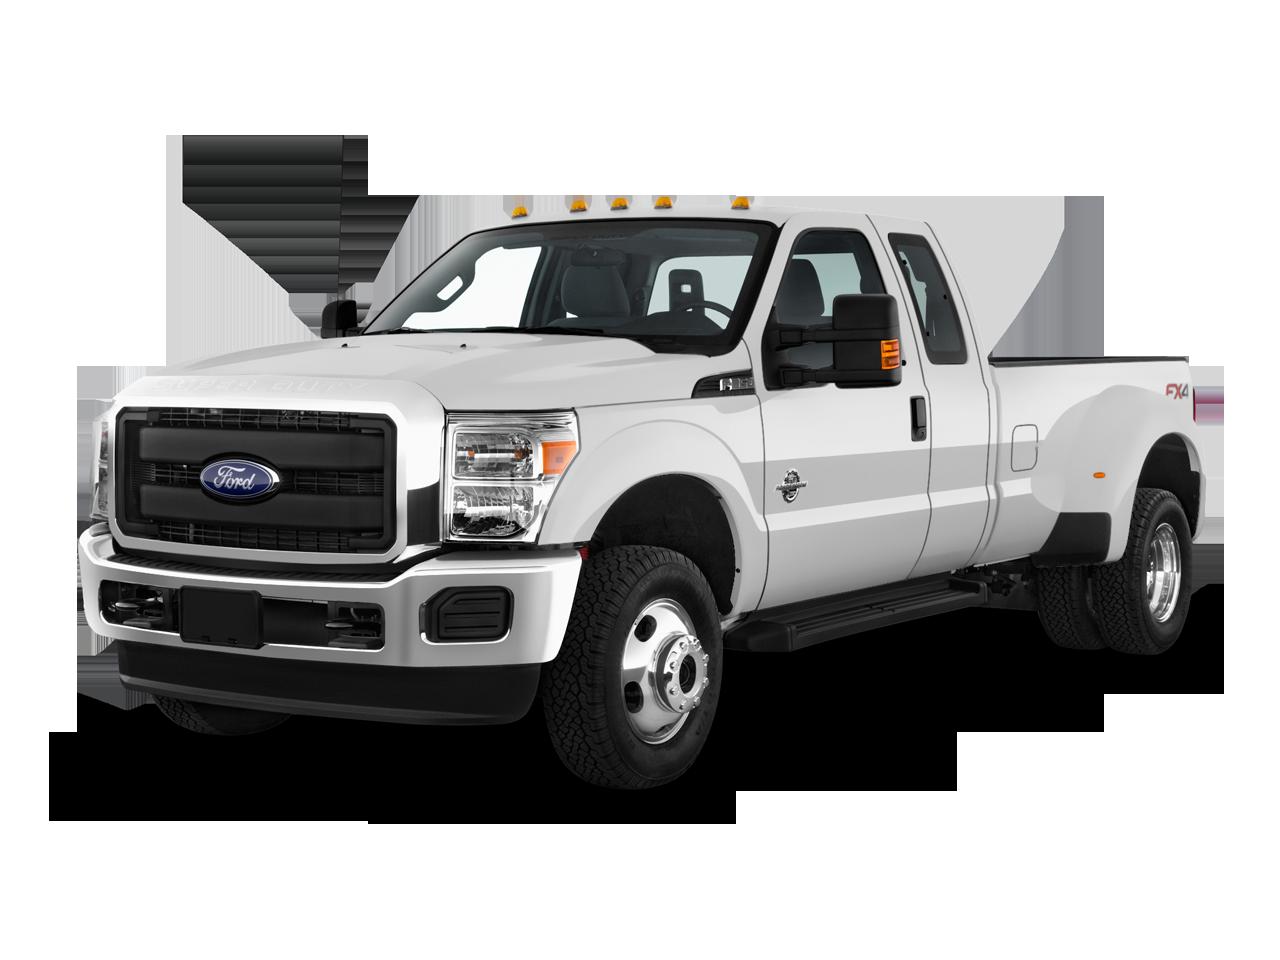 new 2016 ford f 350 super duty 12 ft knapheide body reg cab near old bridge nj all american. Black Bedroom Furniture Sets. Home Design Ideas